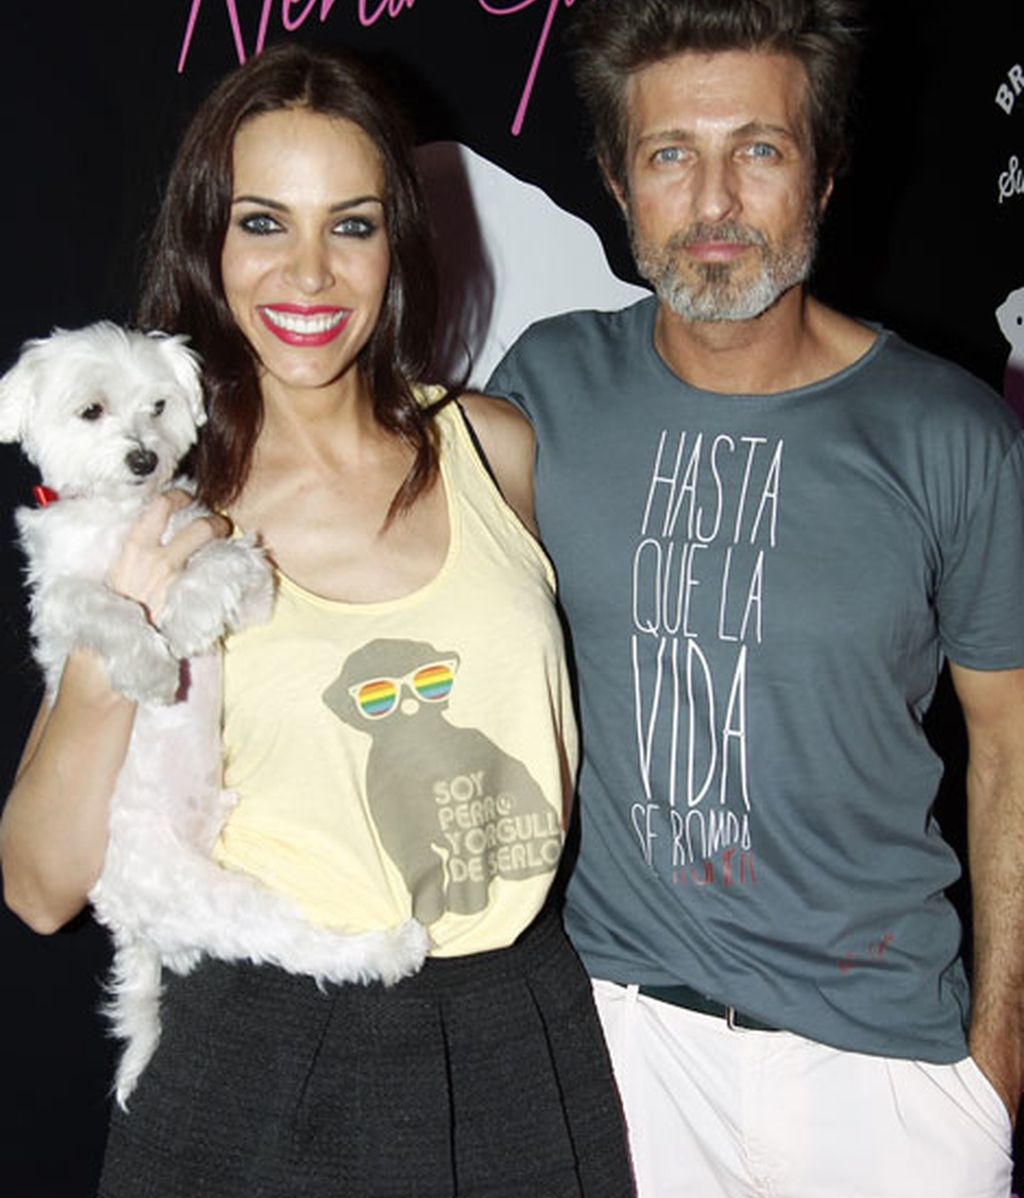 Garmendia estuvo acompañada por su pareja, Jesús Olmedo, y la mascota de ambos